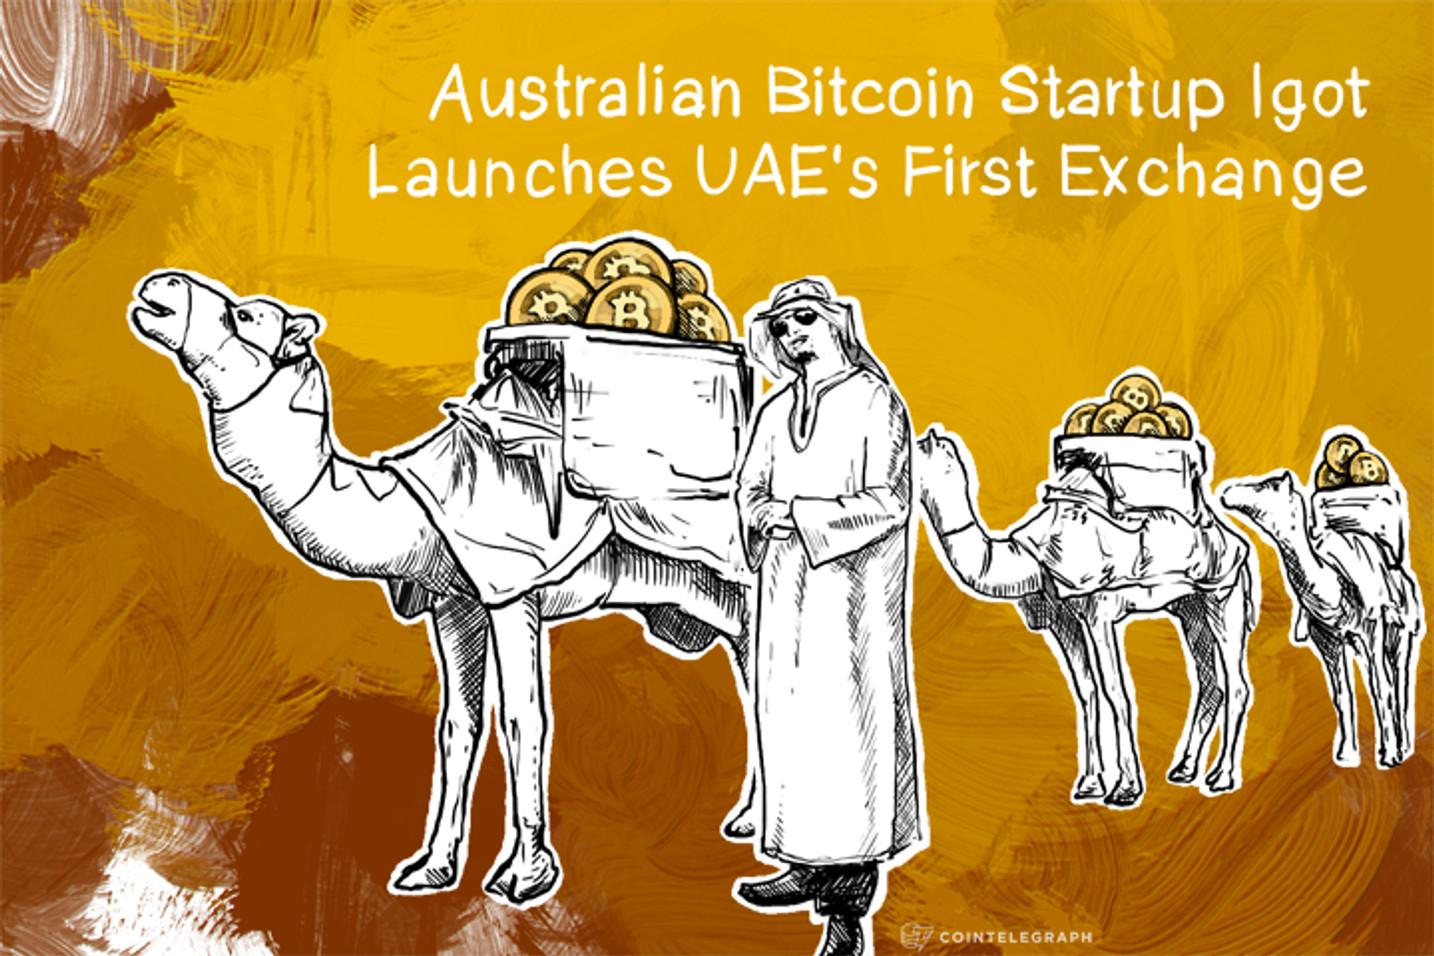 Australian Bitcoin Startup Igot Launches UAE's First Exchange